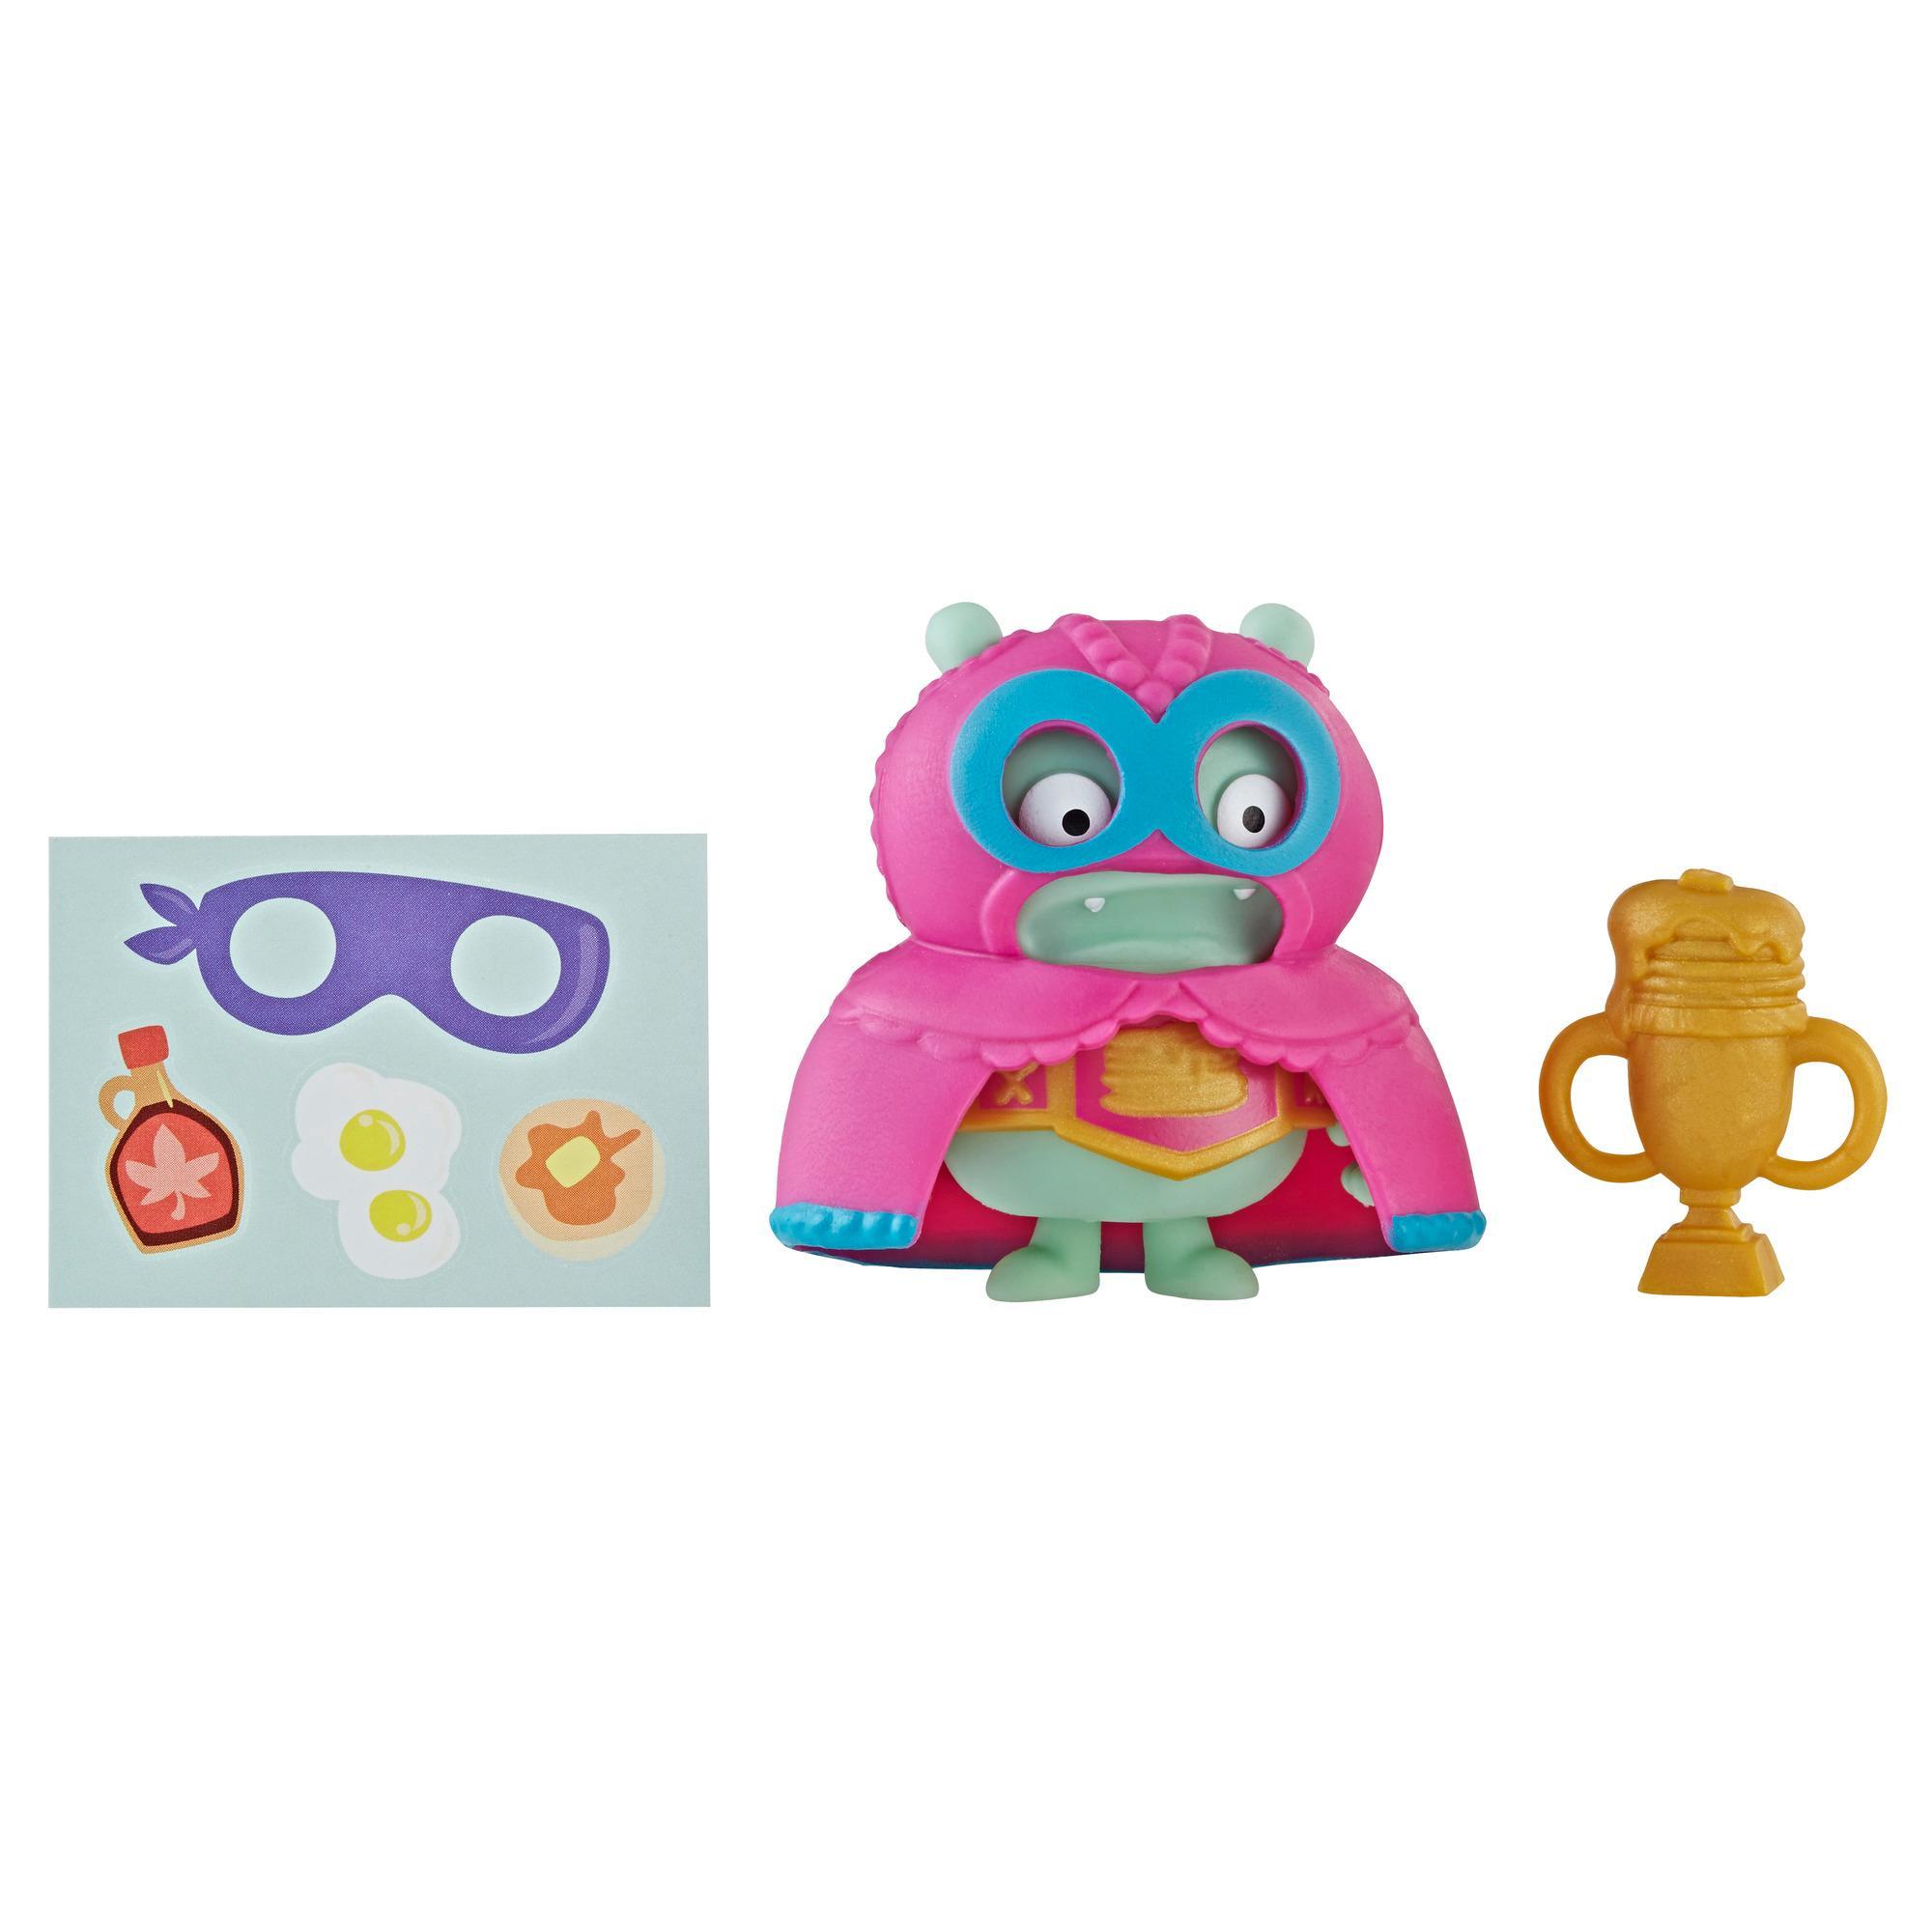 UglyDolls Surprise Disguise - Figura de Pancake Champ Jeer e Acessórios